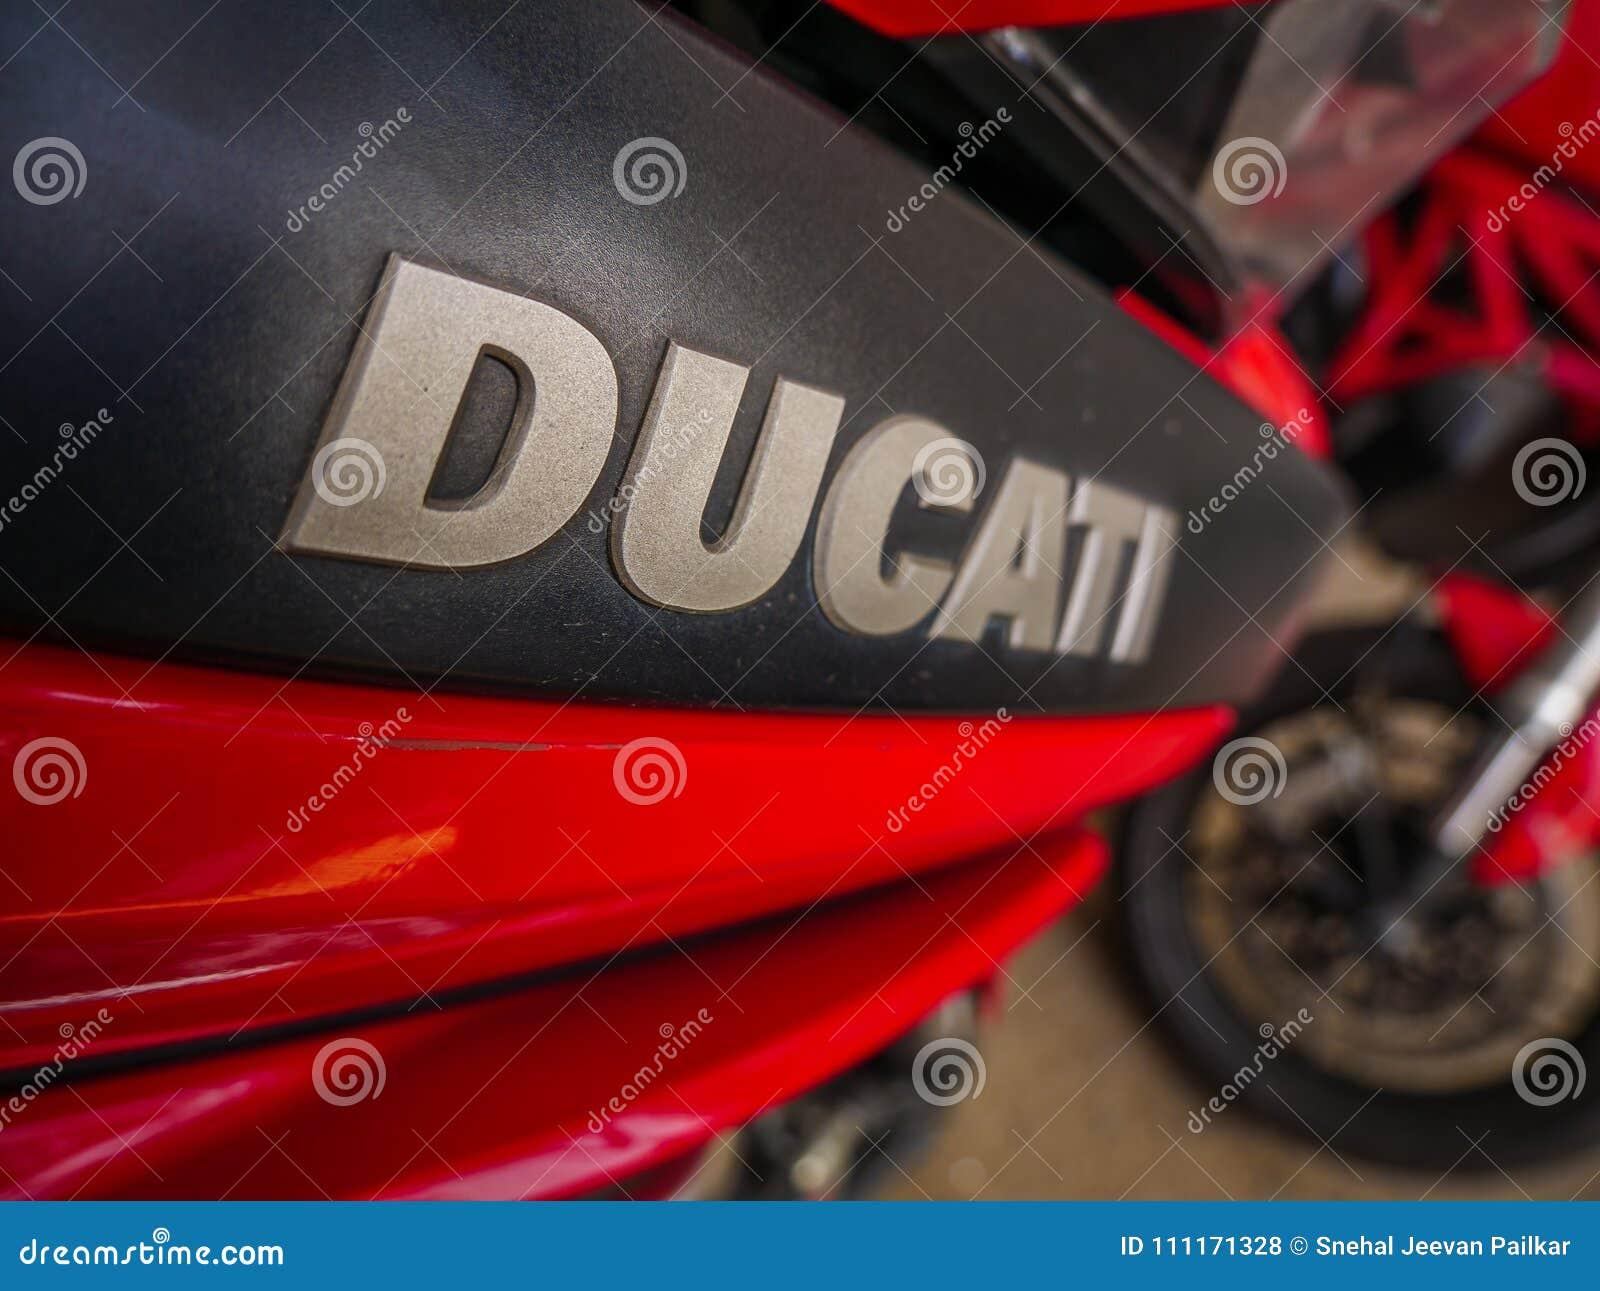 Ducati Logo Editorial Stock Photo Image Of Bike Italian 111171328